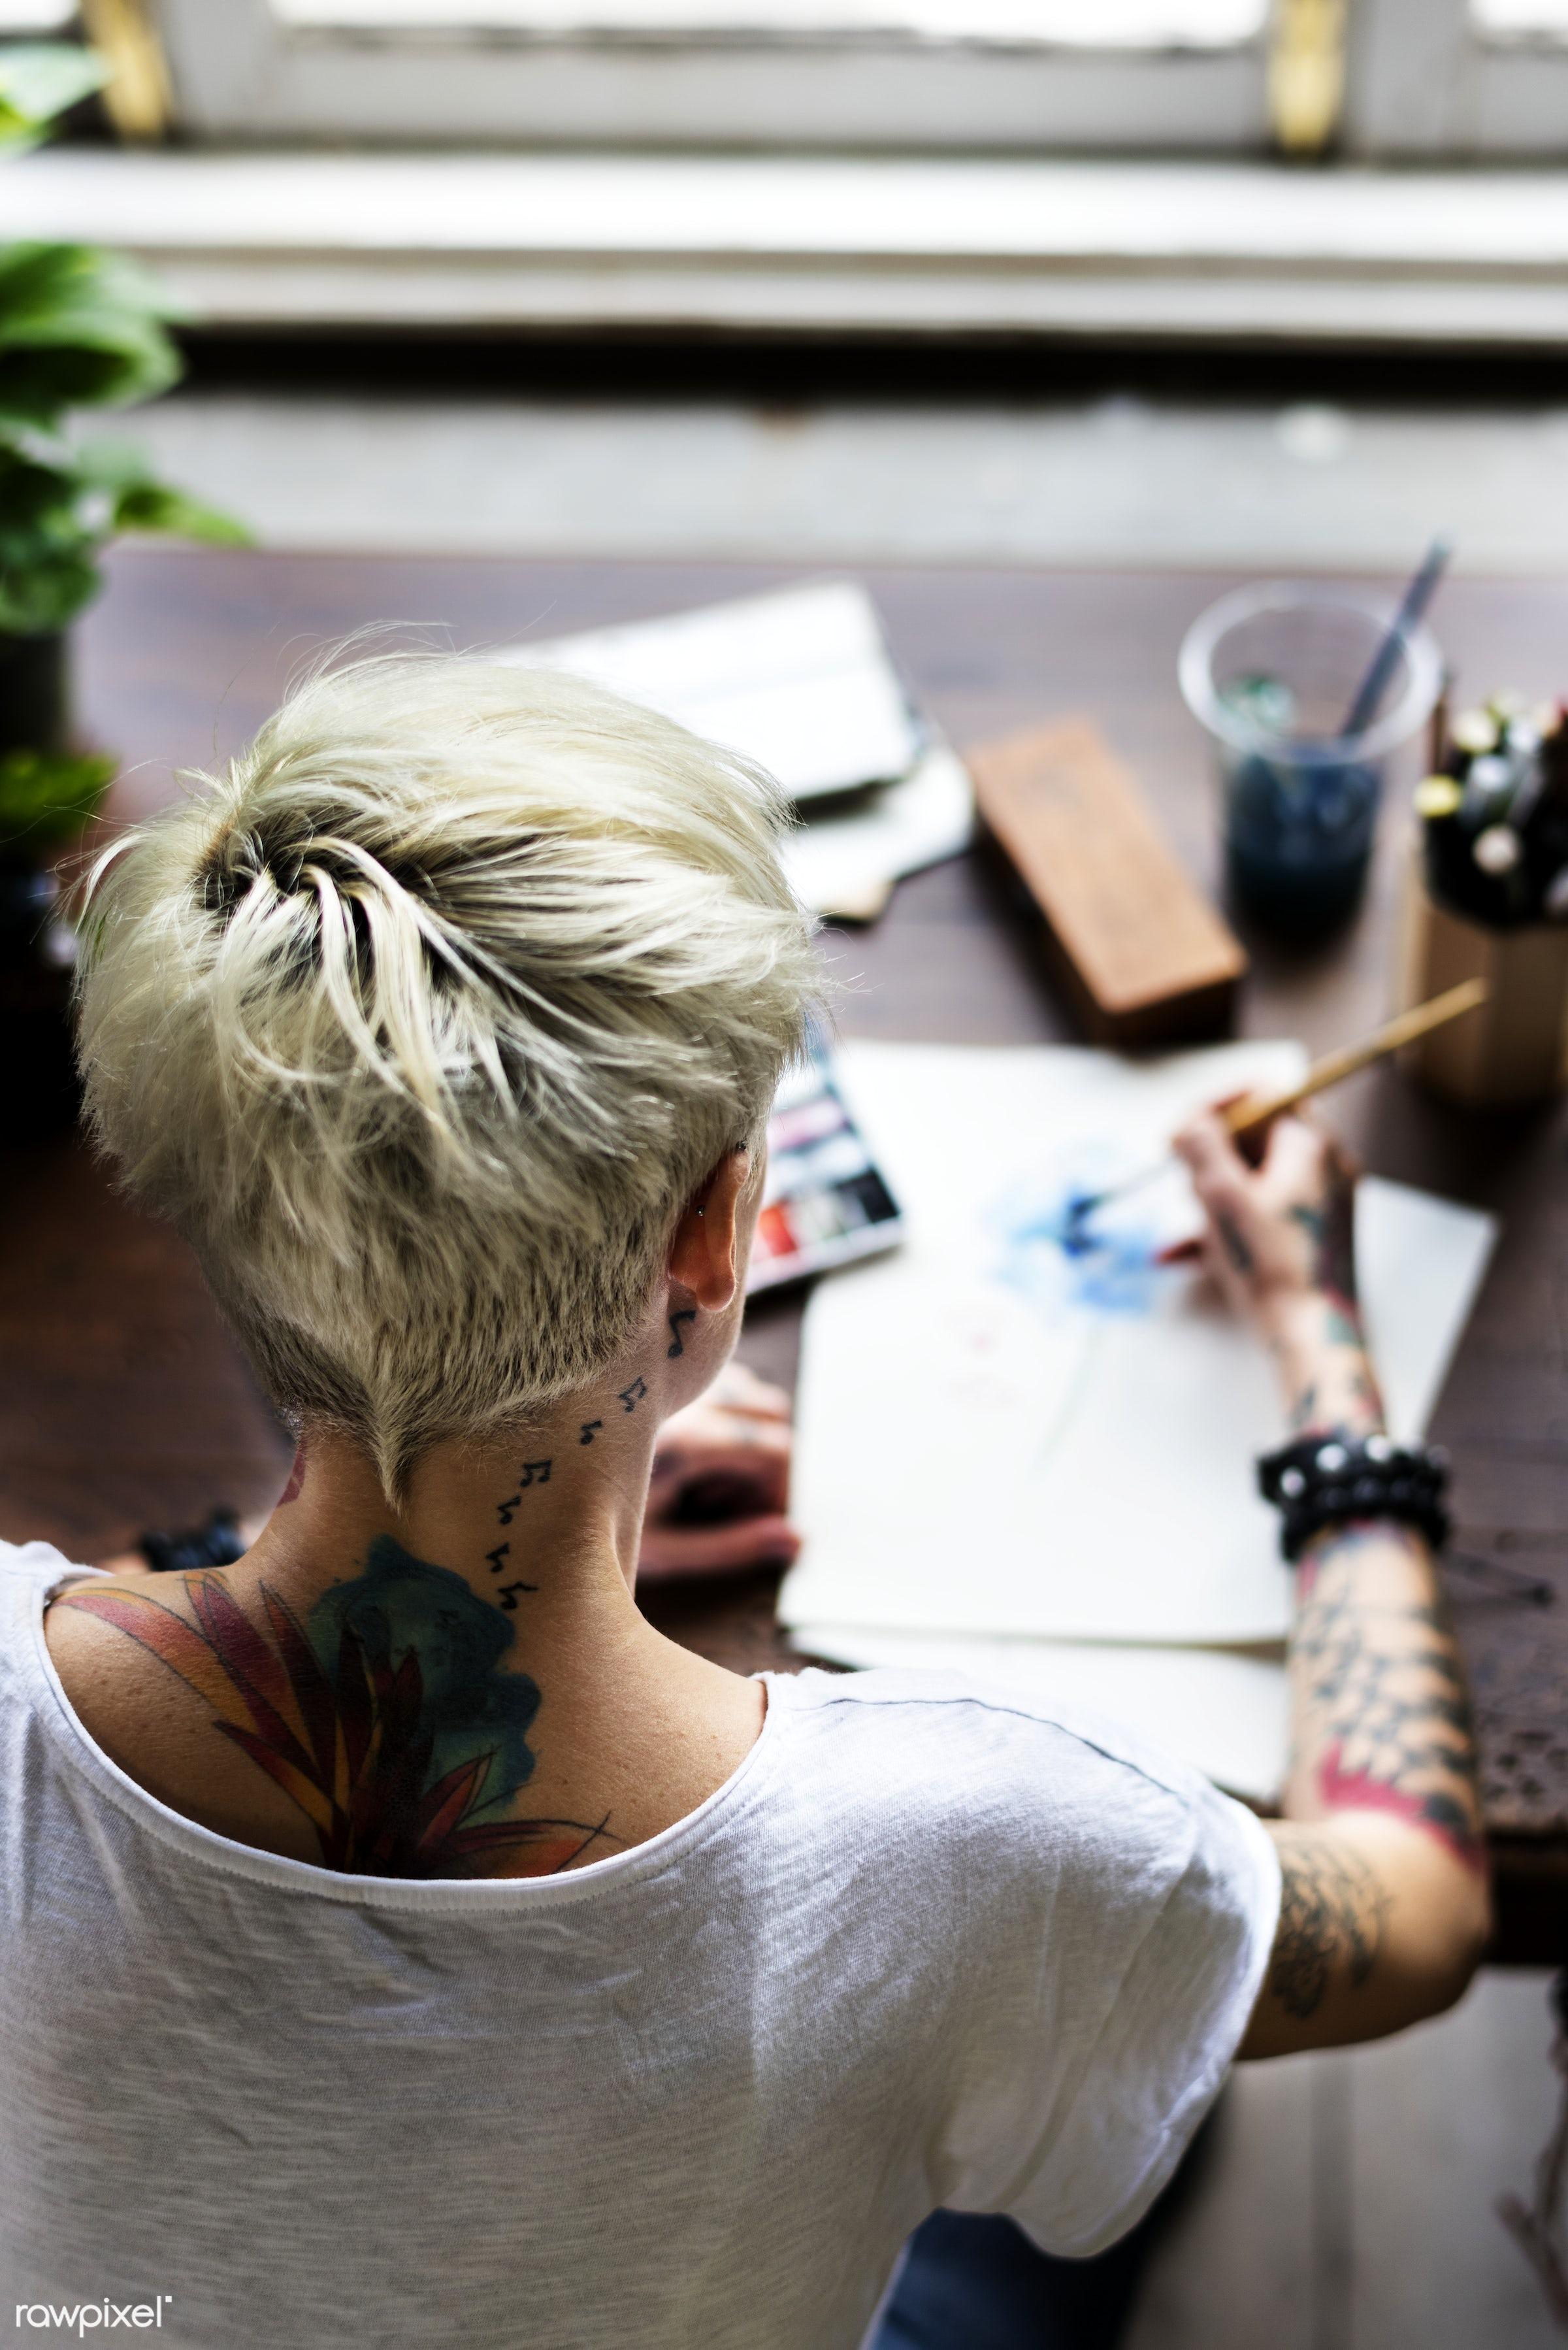 Tattooed girl watercolor art - activity, art, blonde, brush, caucasian, color, design, desk, drawing, flower, hobby, leisure...